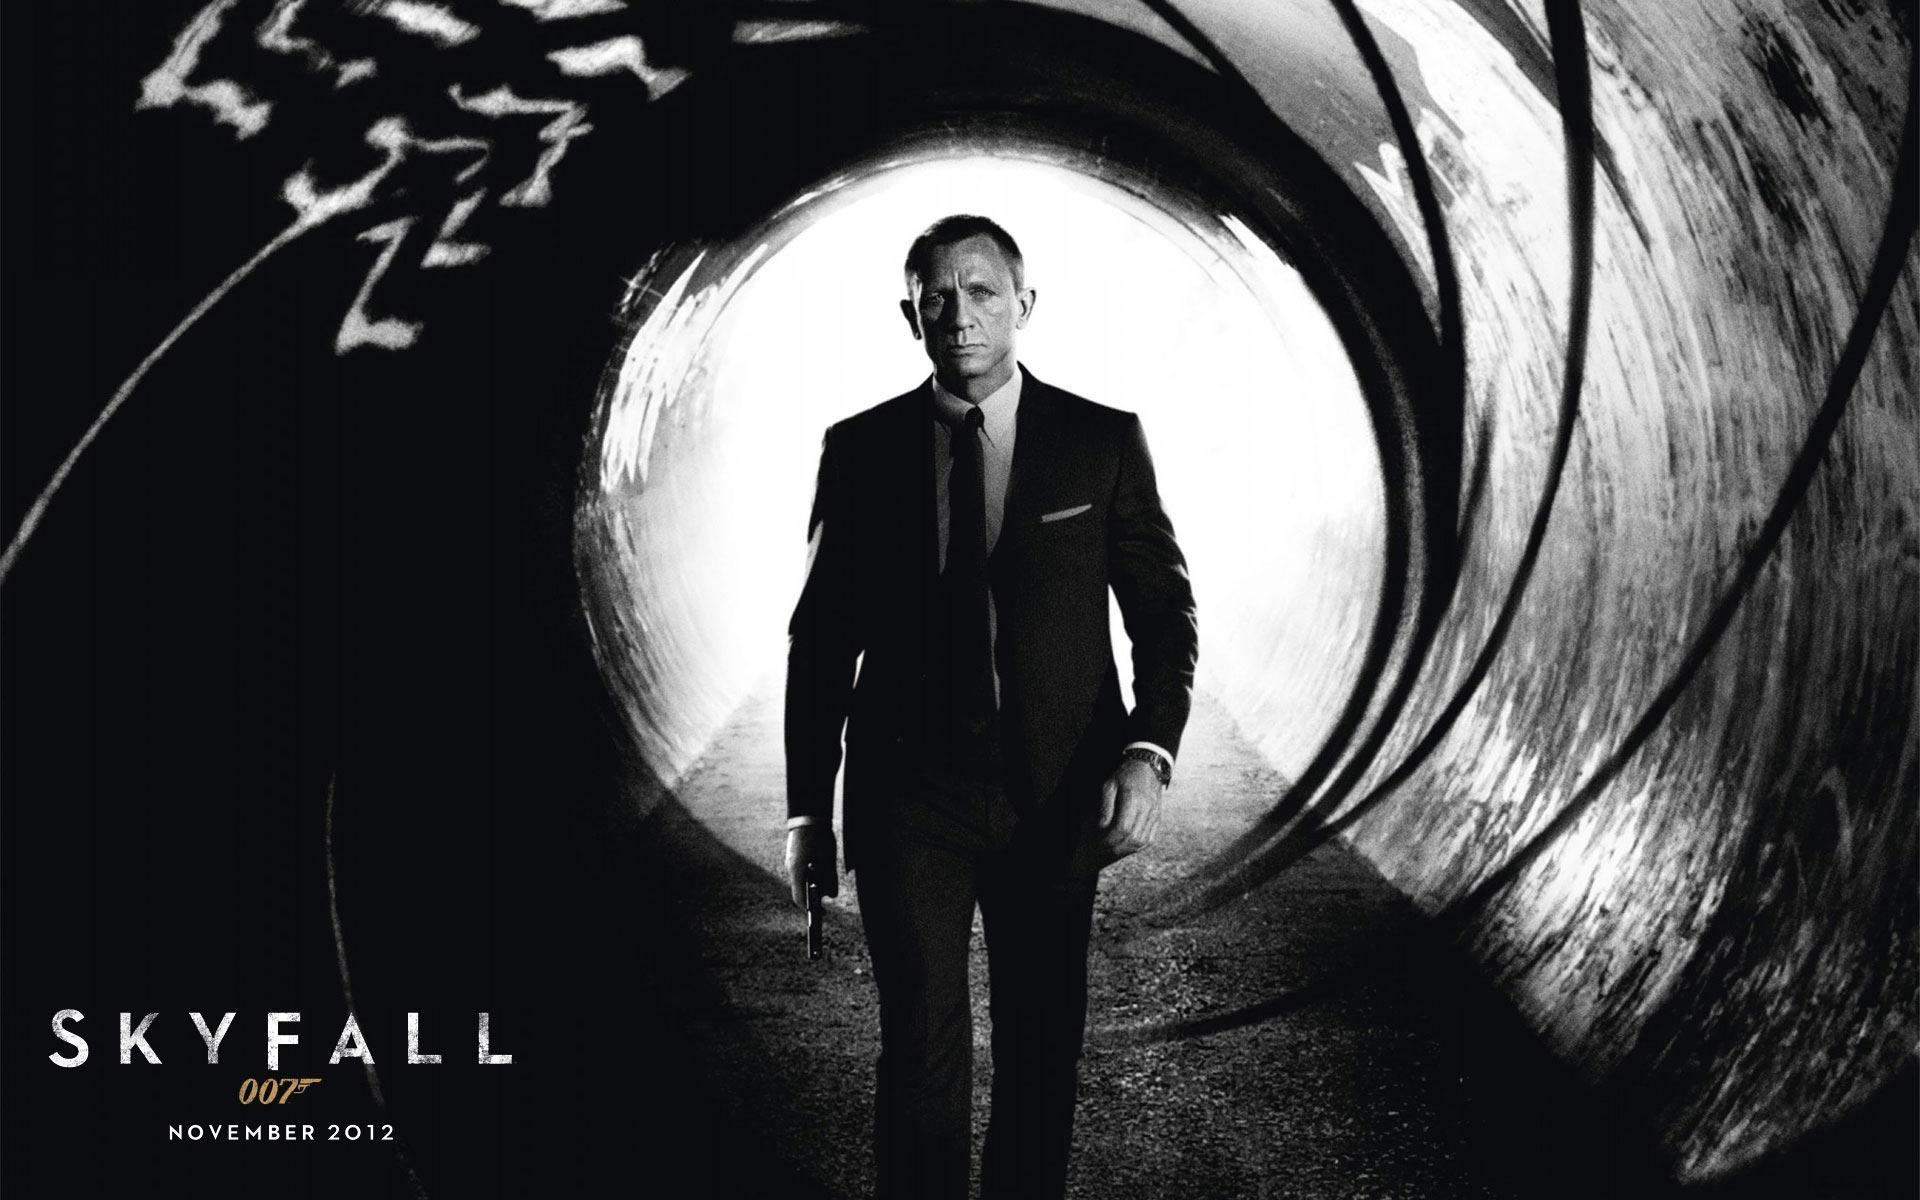 Bond, James Bond- The History of My Namesake